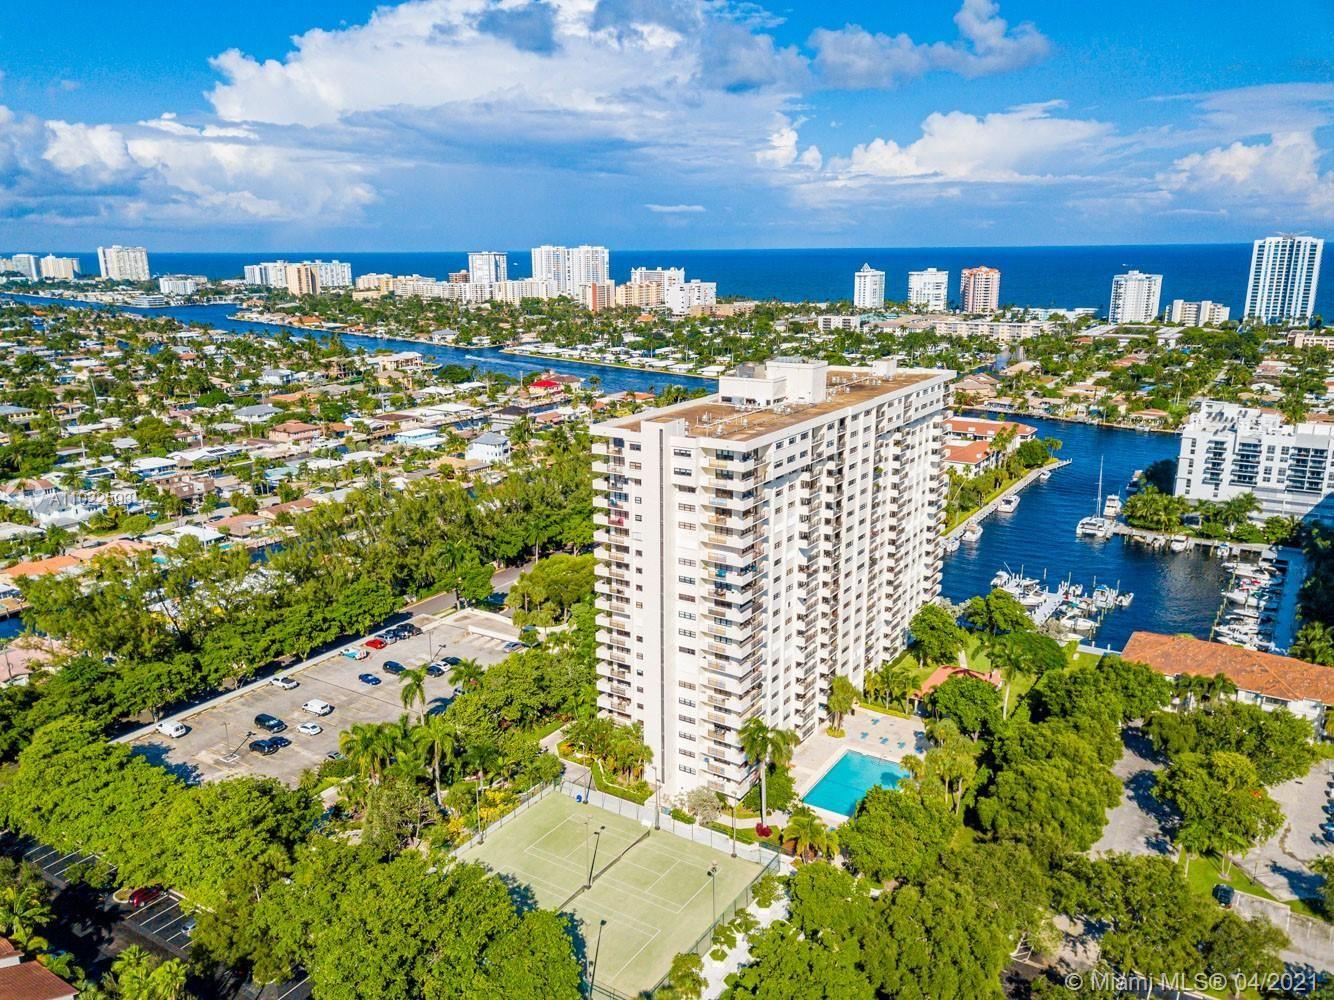 Photo of 3200 Port Royale Dr N #1210, Fort Lauderdale, FL 33308 (MLS # A11022593)